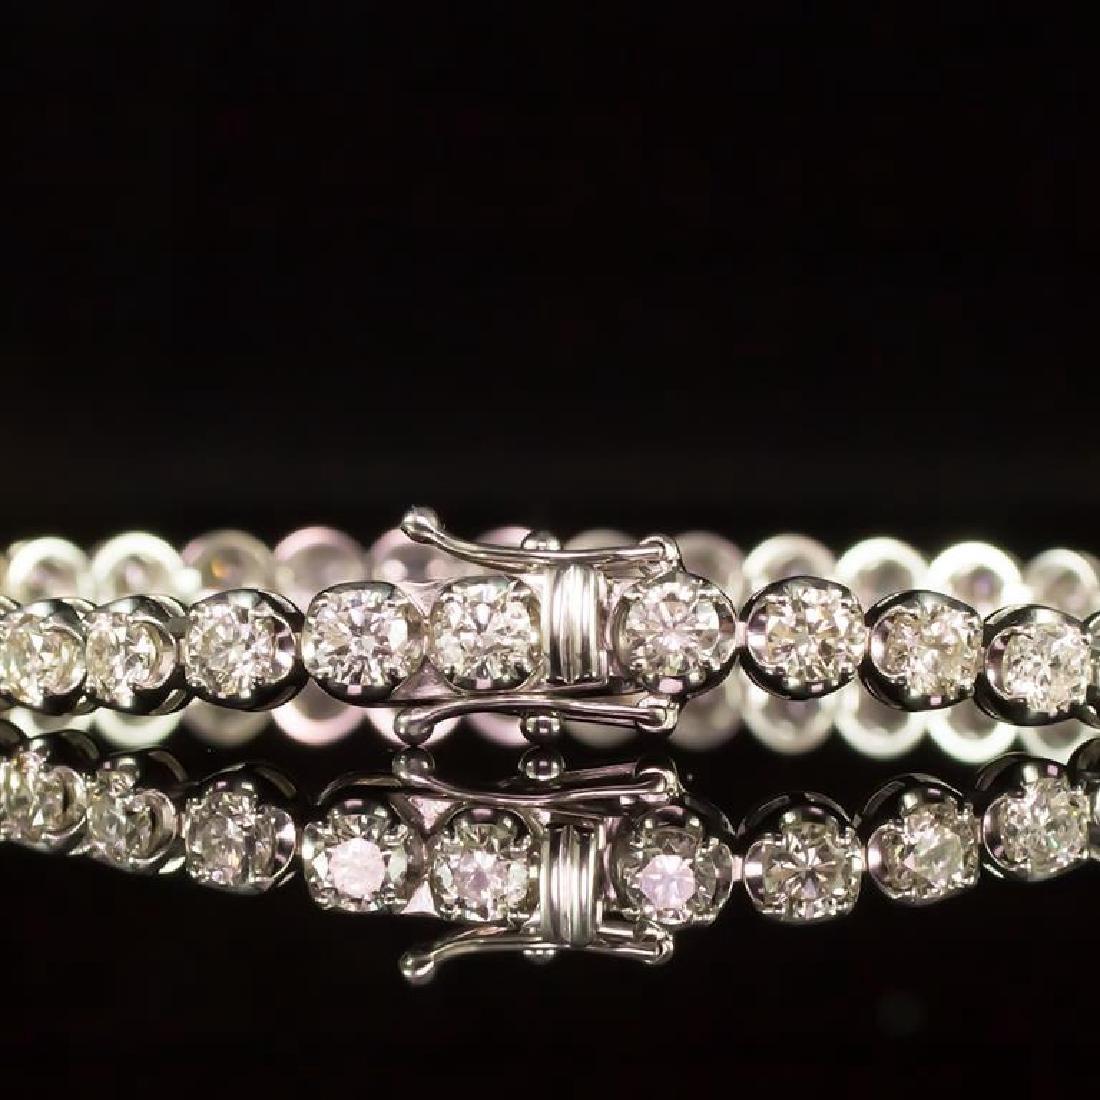 18K Gold 7.33ct Diamond Bracelet - 3